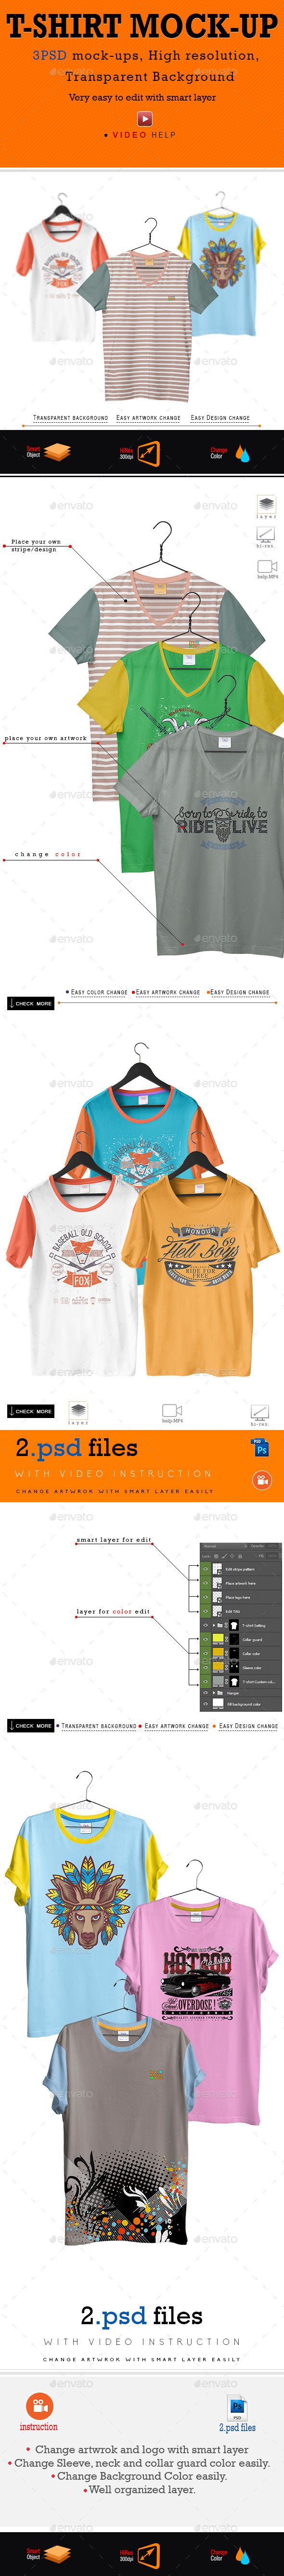 Design t shirt vistaprint - T Shirt Mock_up